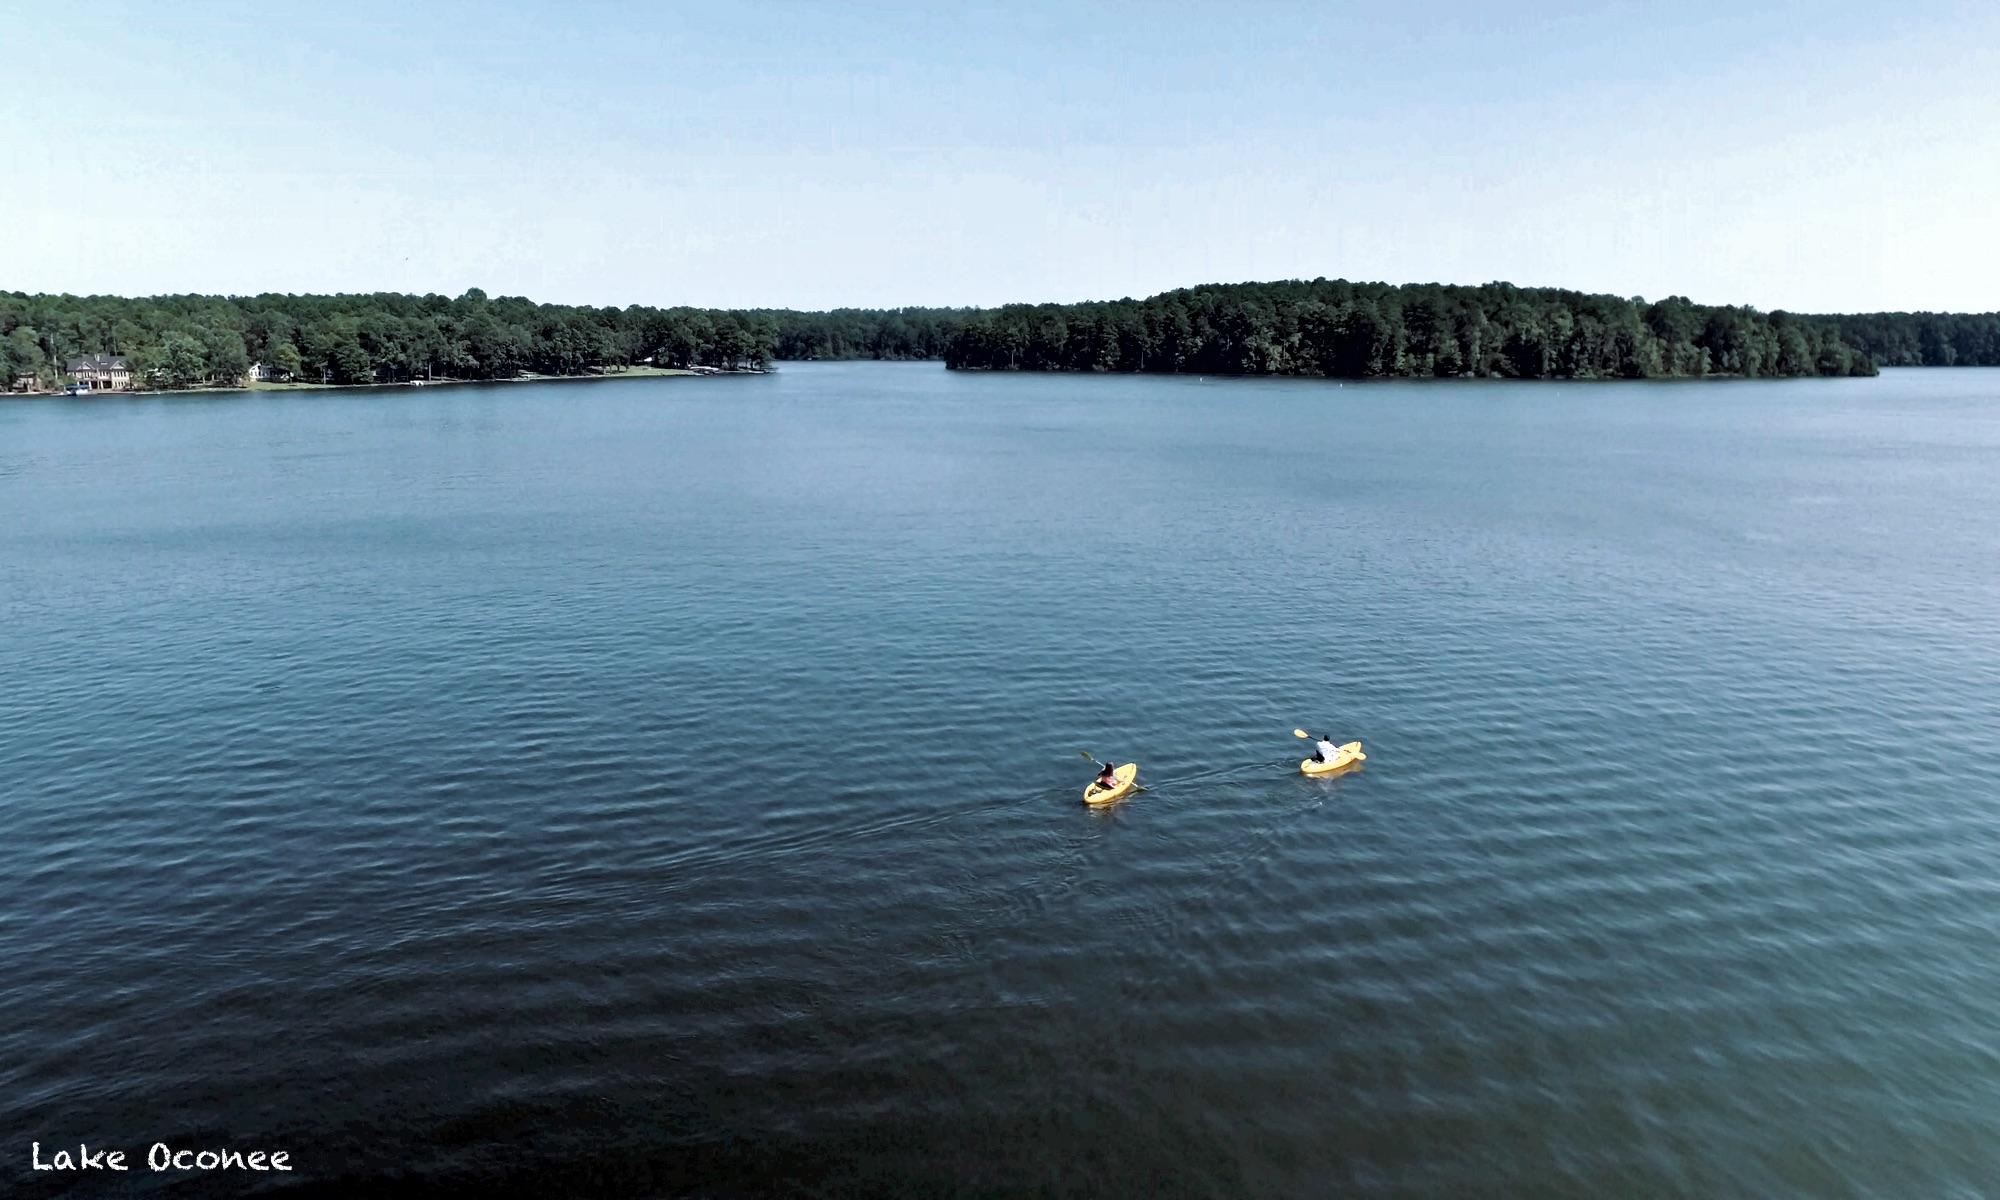 Lake Oconee Attractions